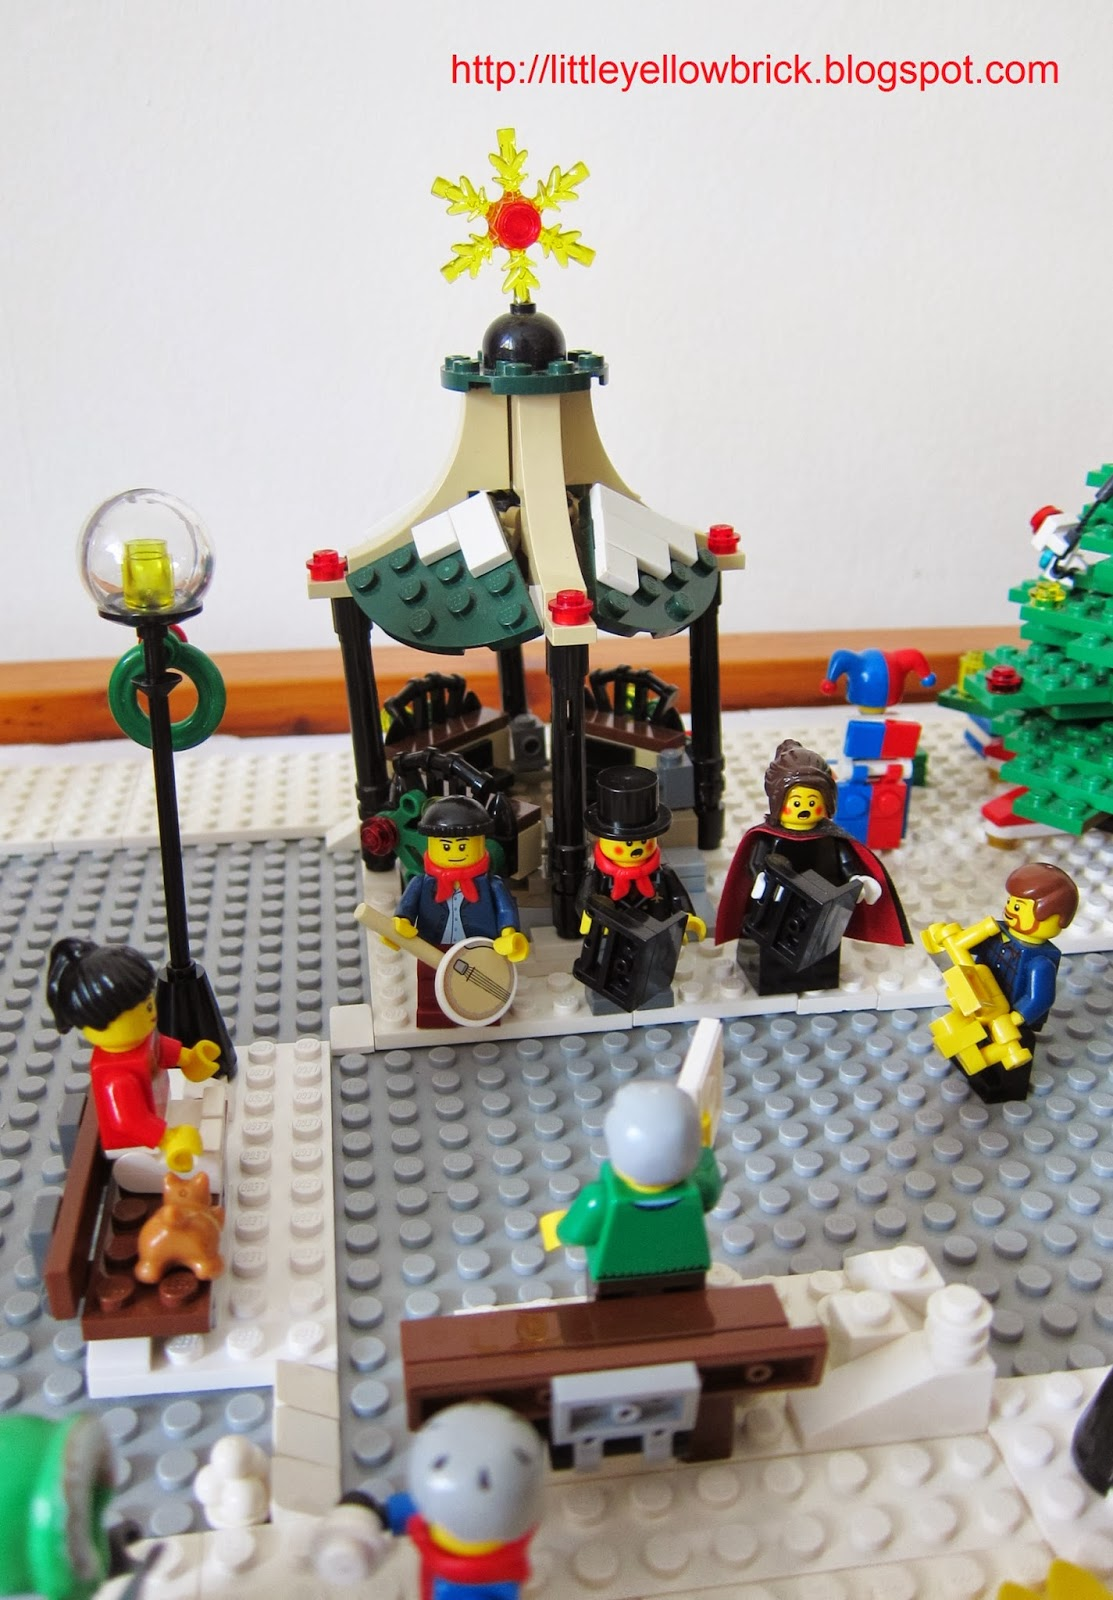 Little Yellow Brick A Lego Blog Our Lego Winter Village